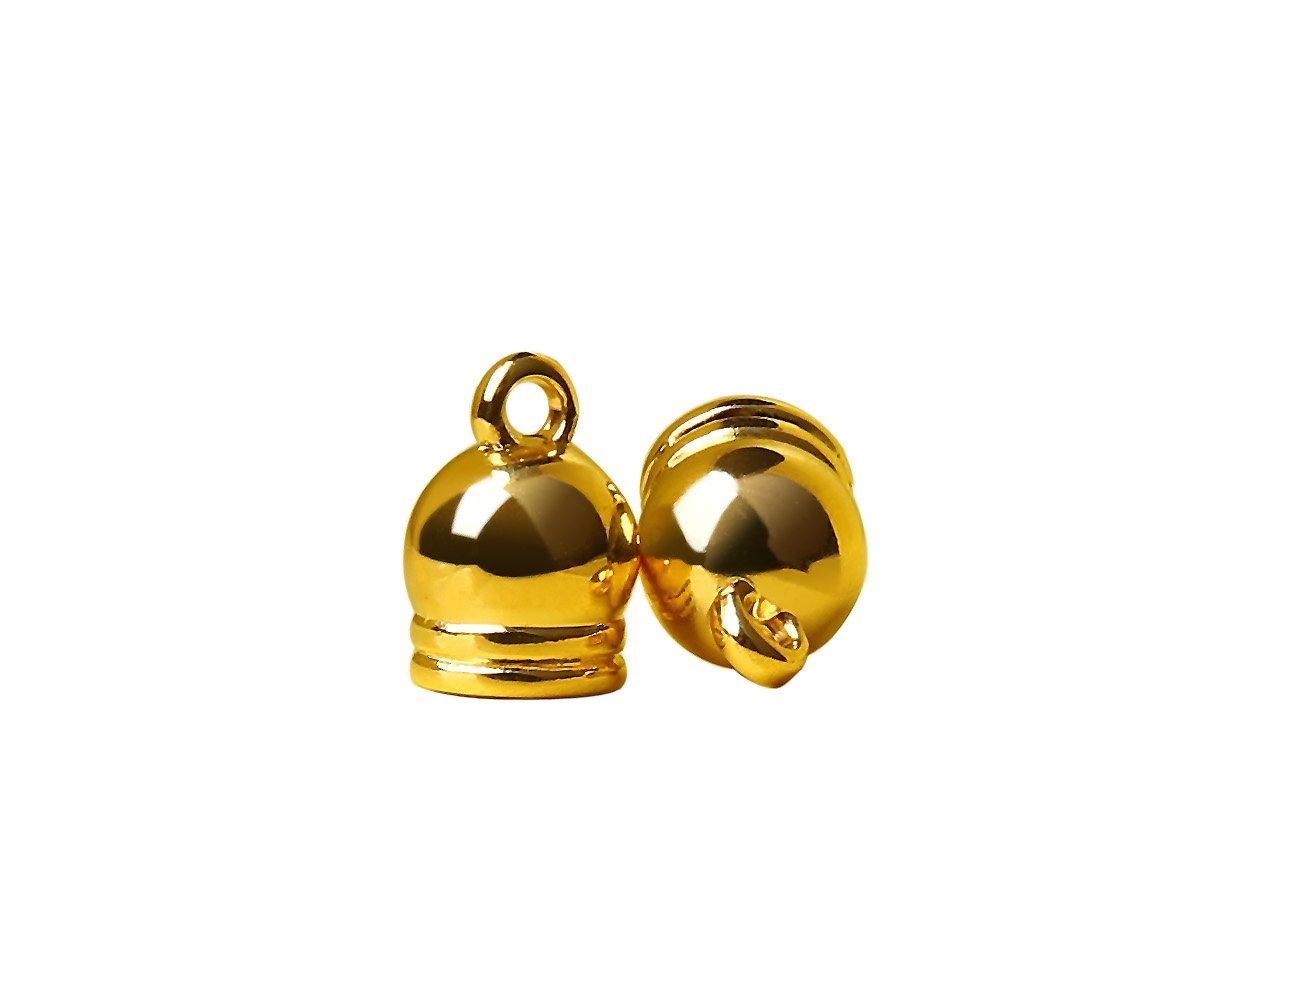 Tassels Tops 100 Pcs Tassels Accessories Charms Pendant Tassels Caps Jewelry Findings #1546 Gold